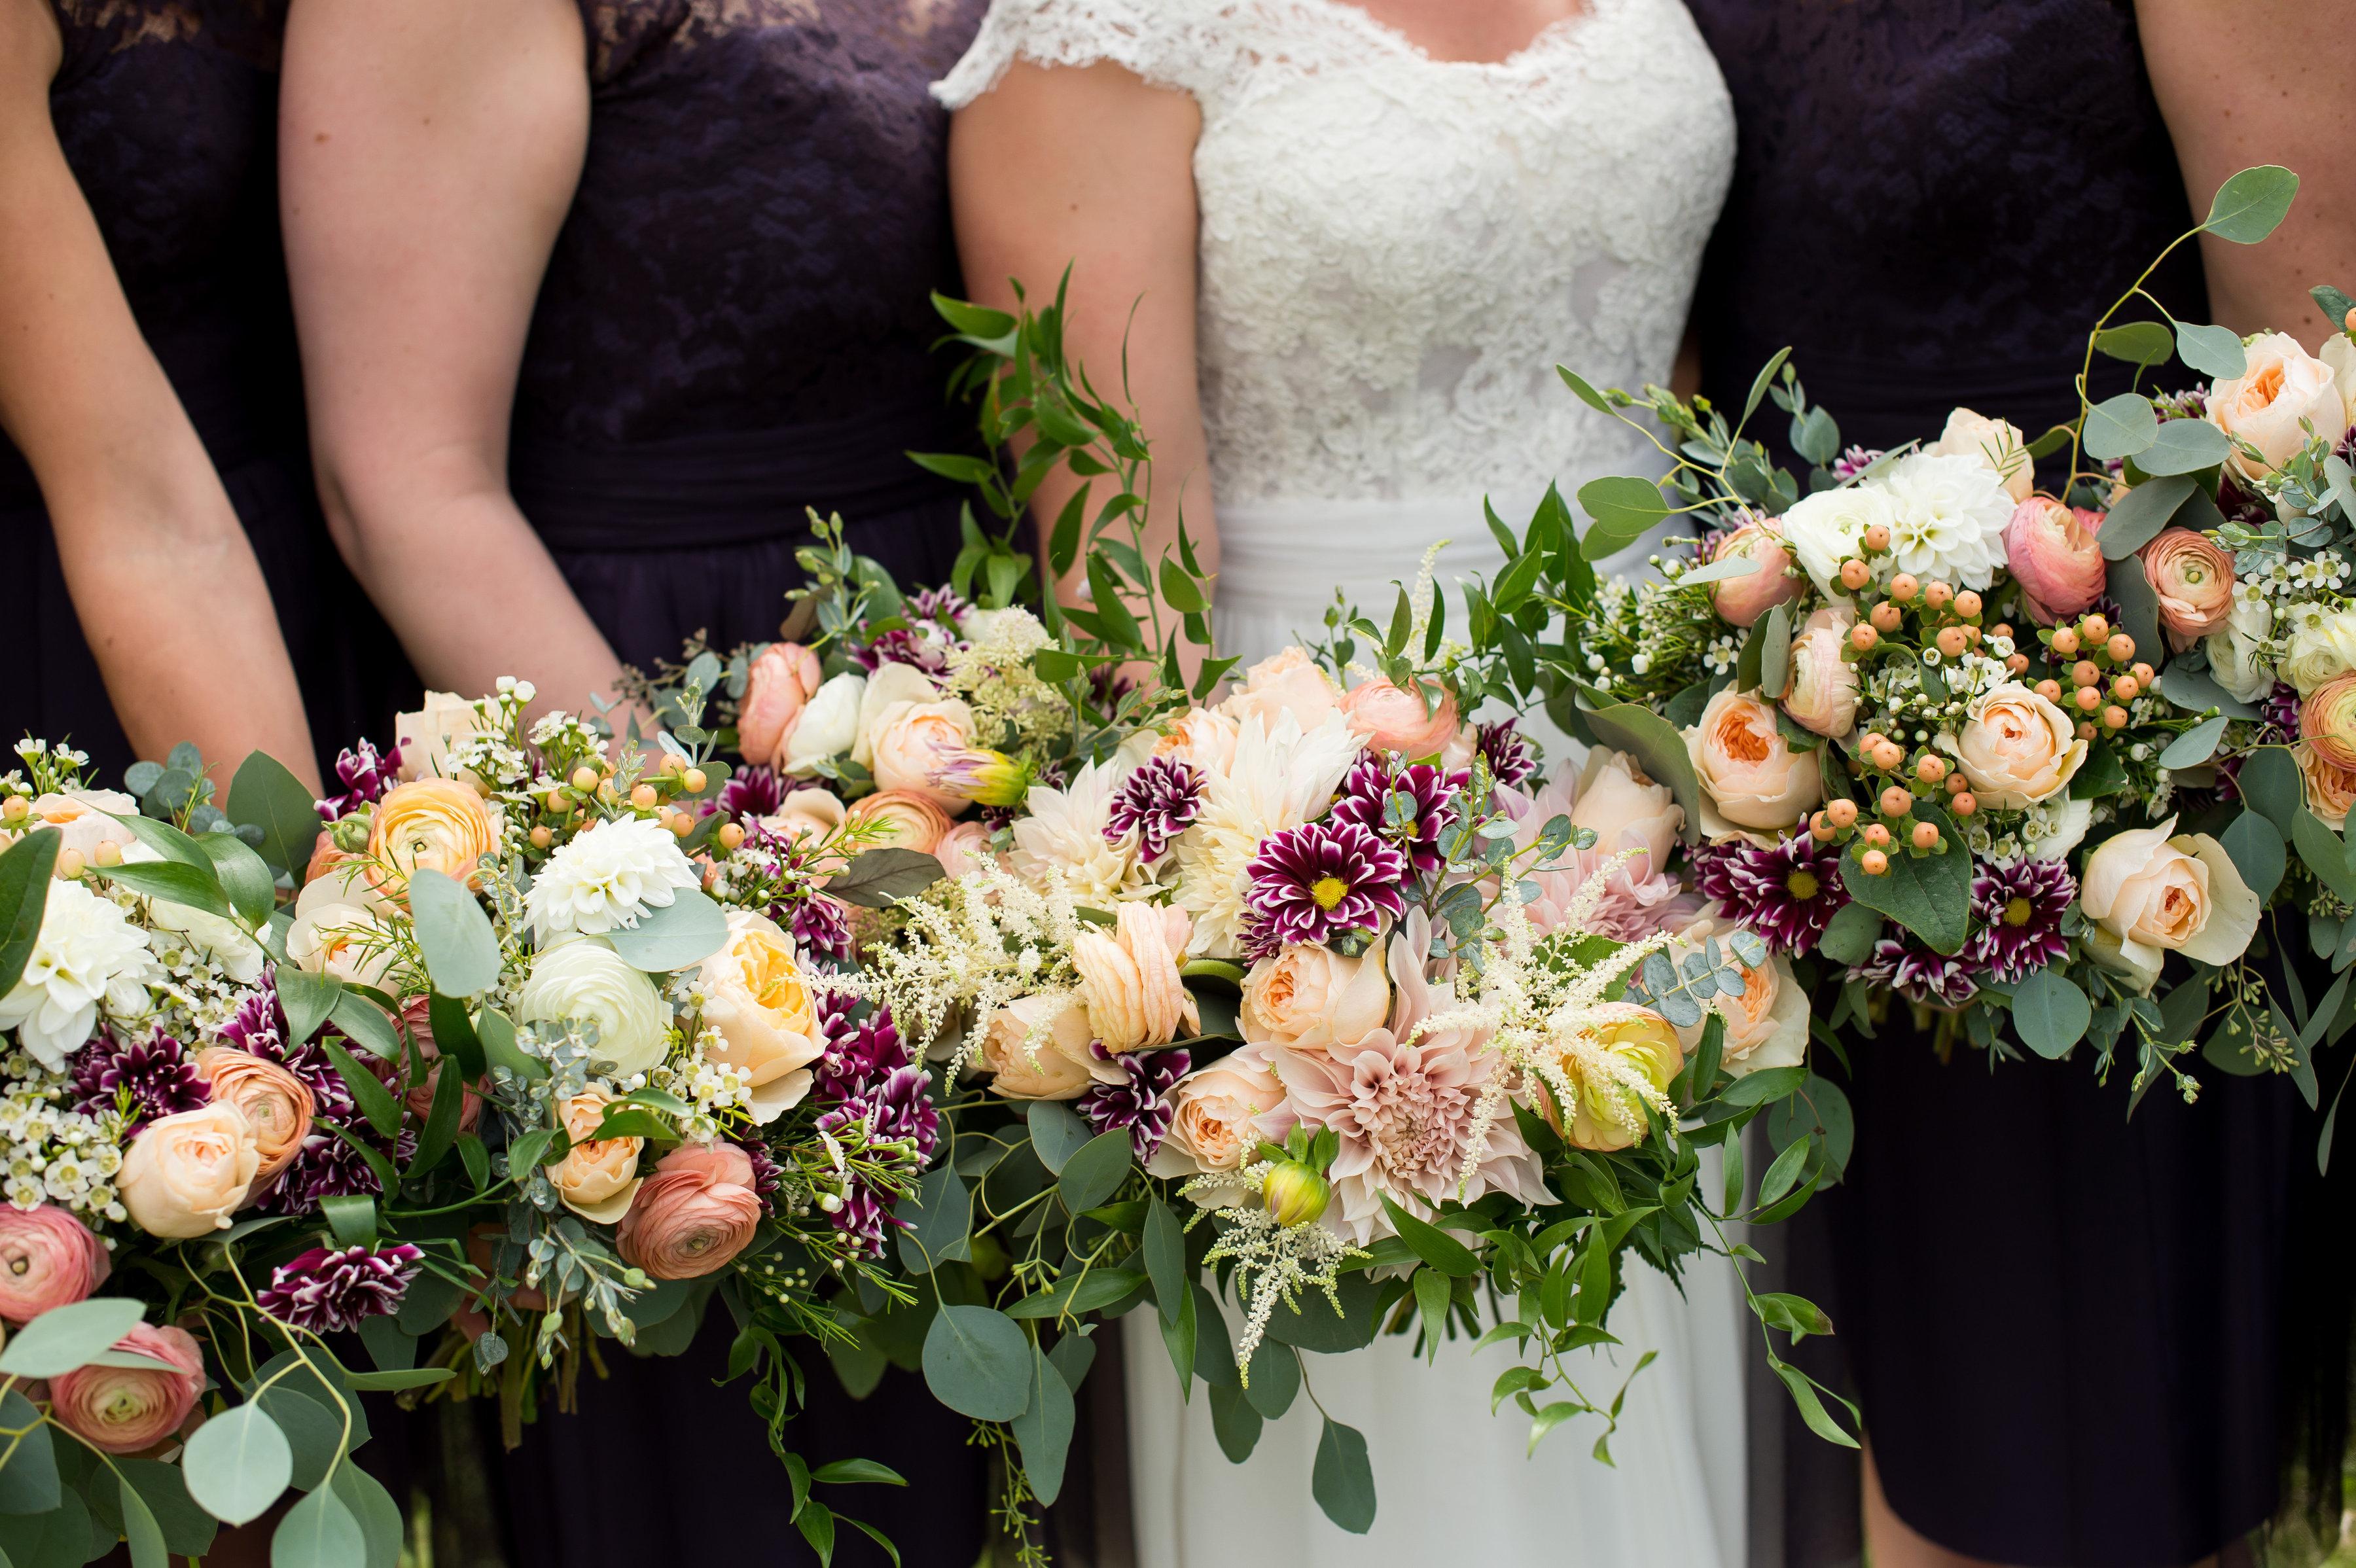 Stunning Outdoor Vermont Wedding - North Shore Weddings & Events